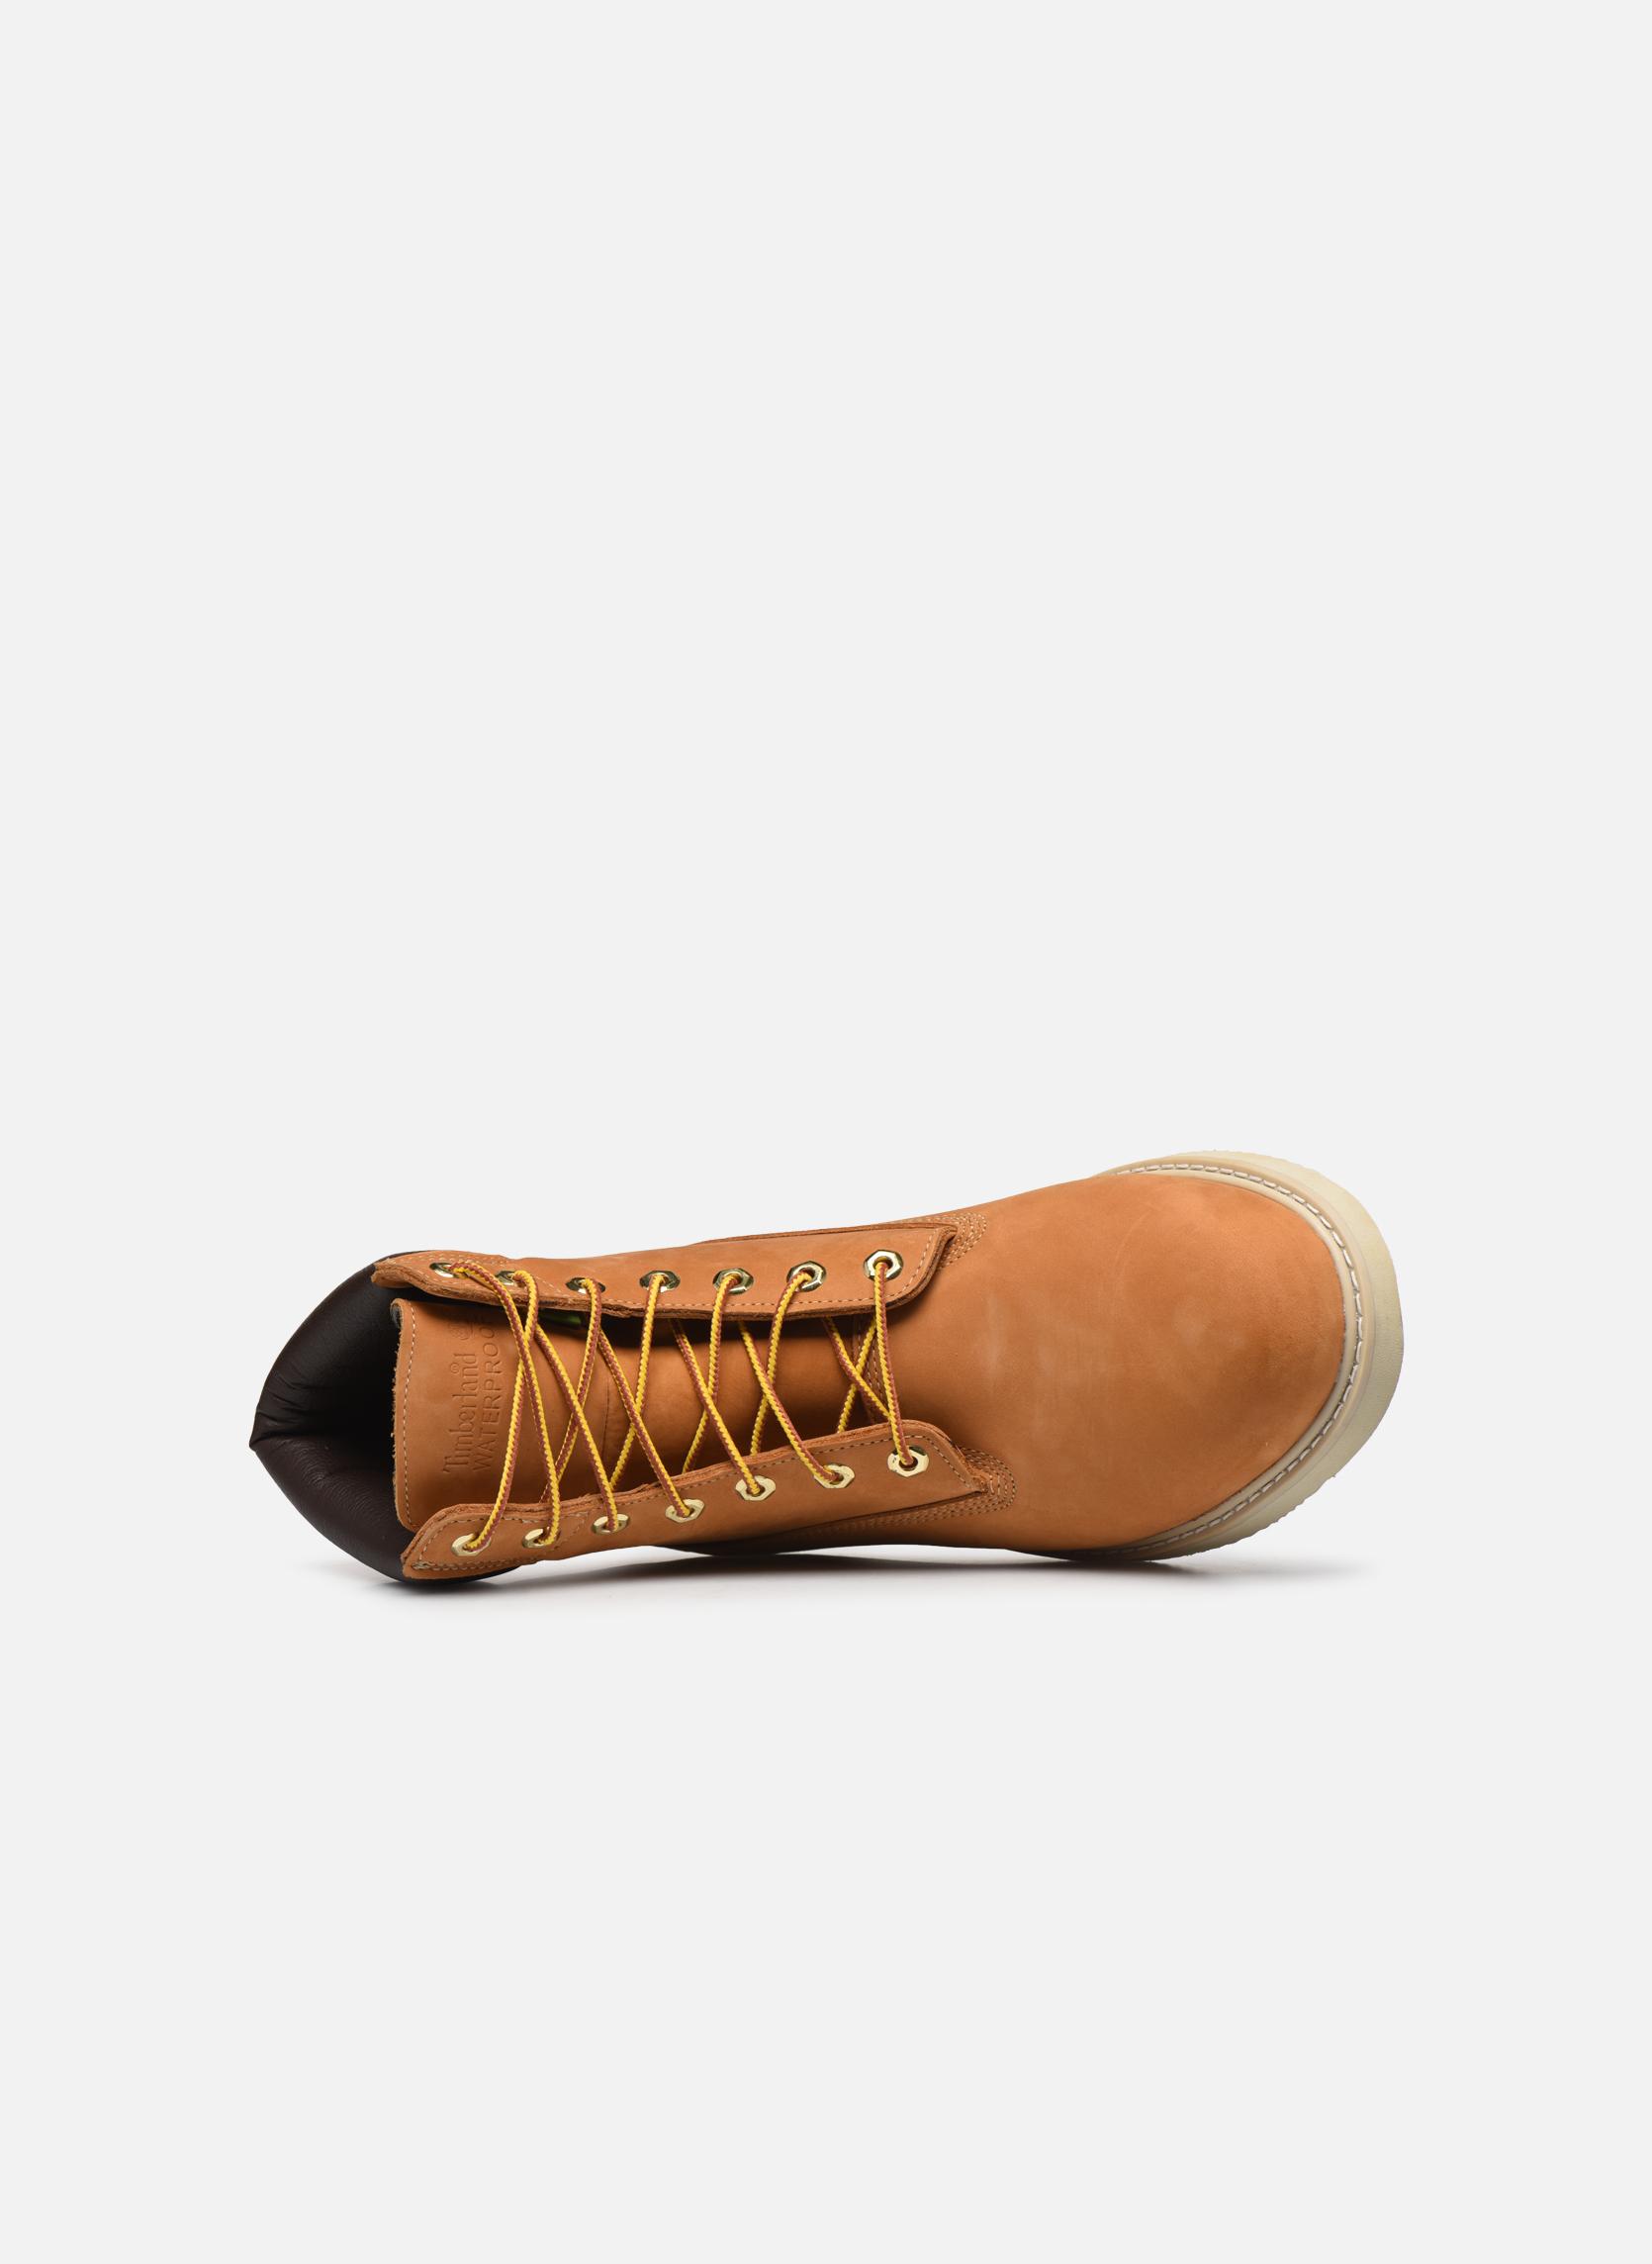 Bottines et boots Timberland 6 in wedge Marron vue gauche